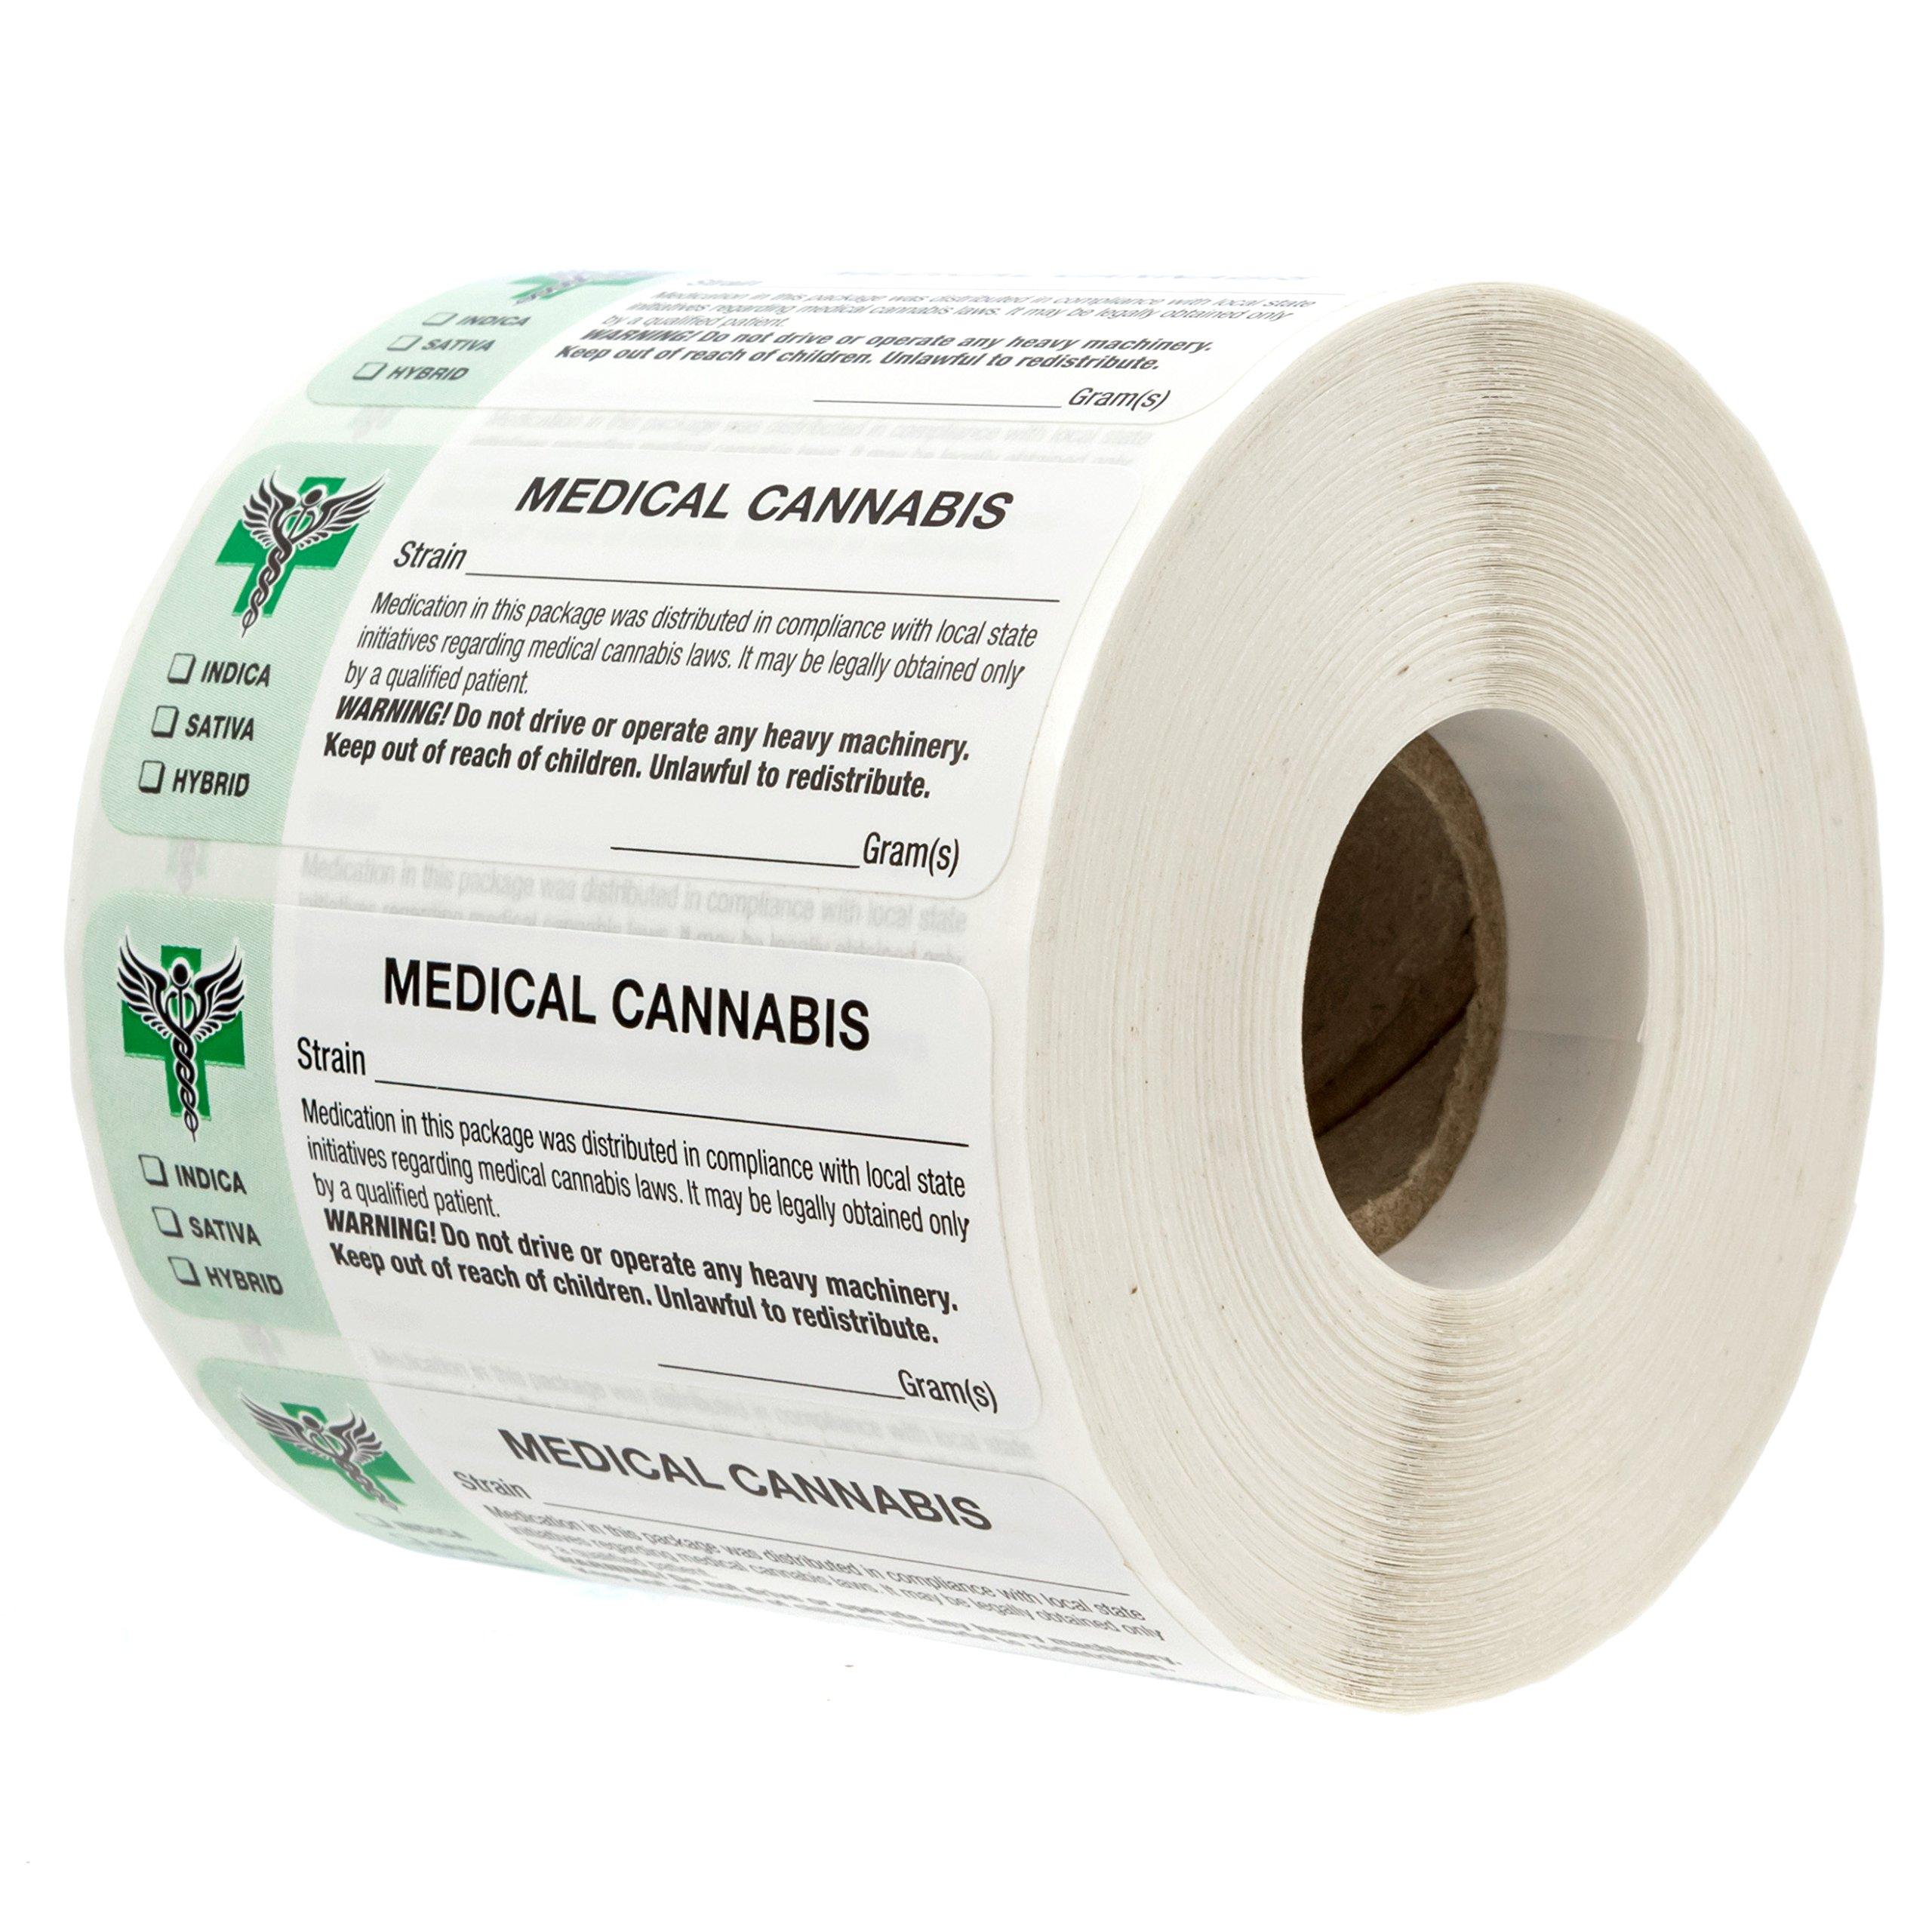 1 Inch 500 Labels Total Oregon Universal Marijuana Symbol Warning Stickers